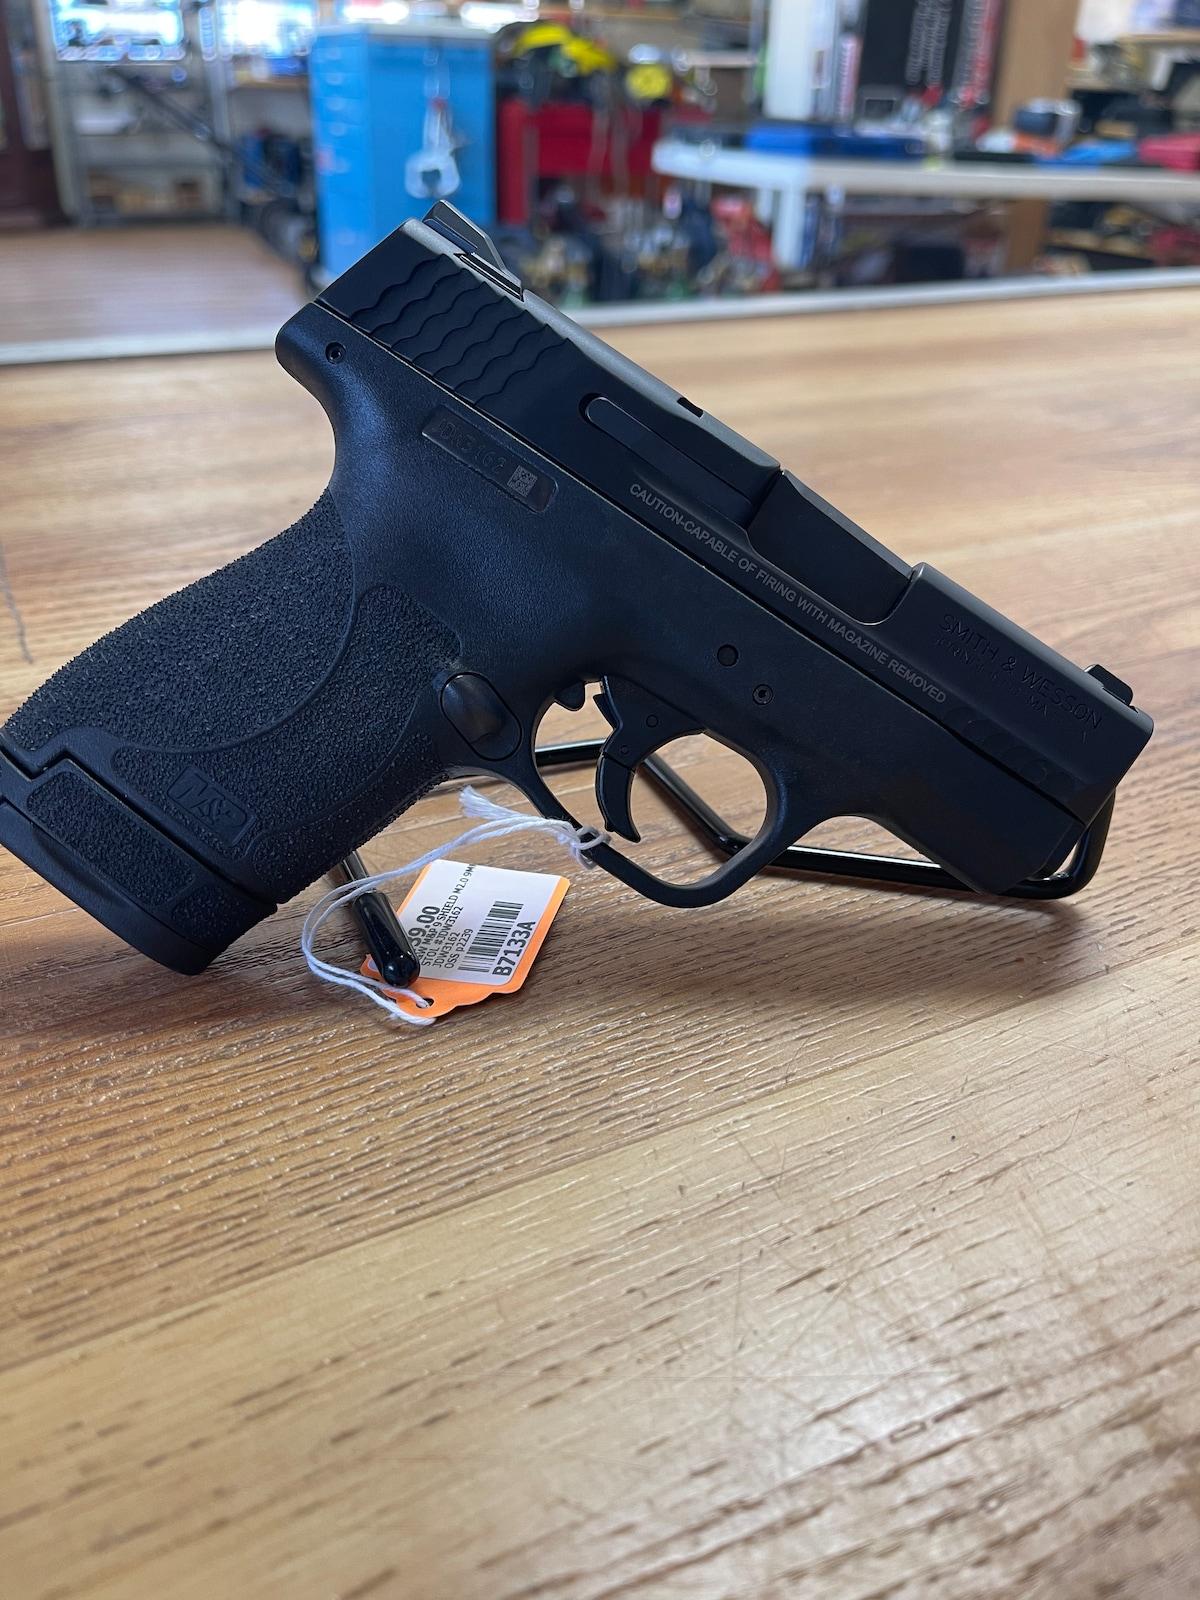 SMITH & WESSON 9mm M&P9 SHIELD M2.0